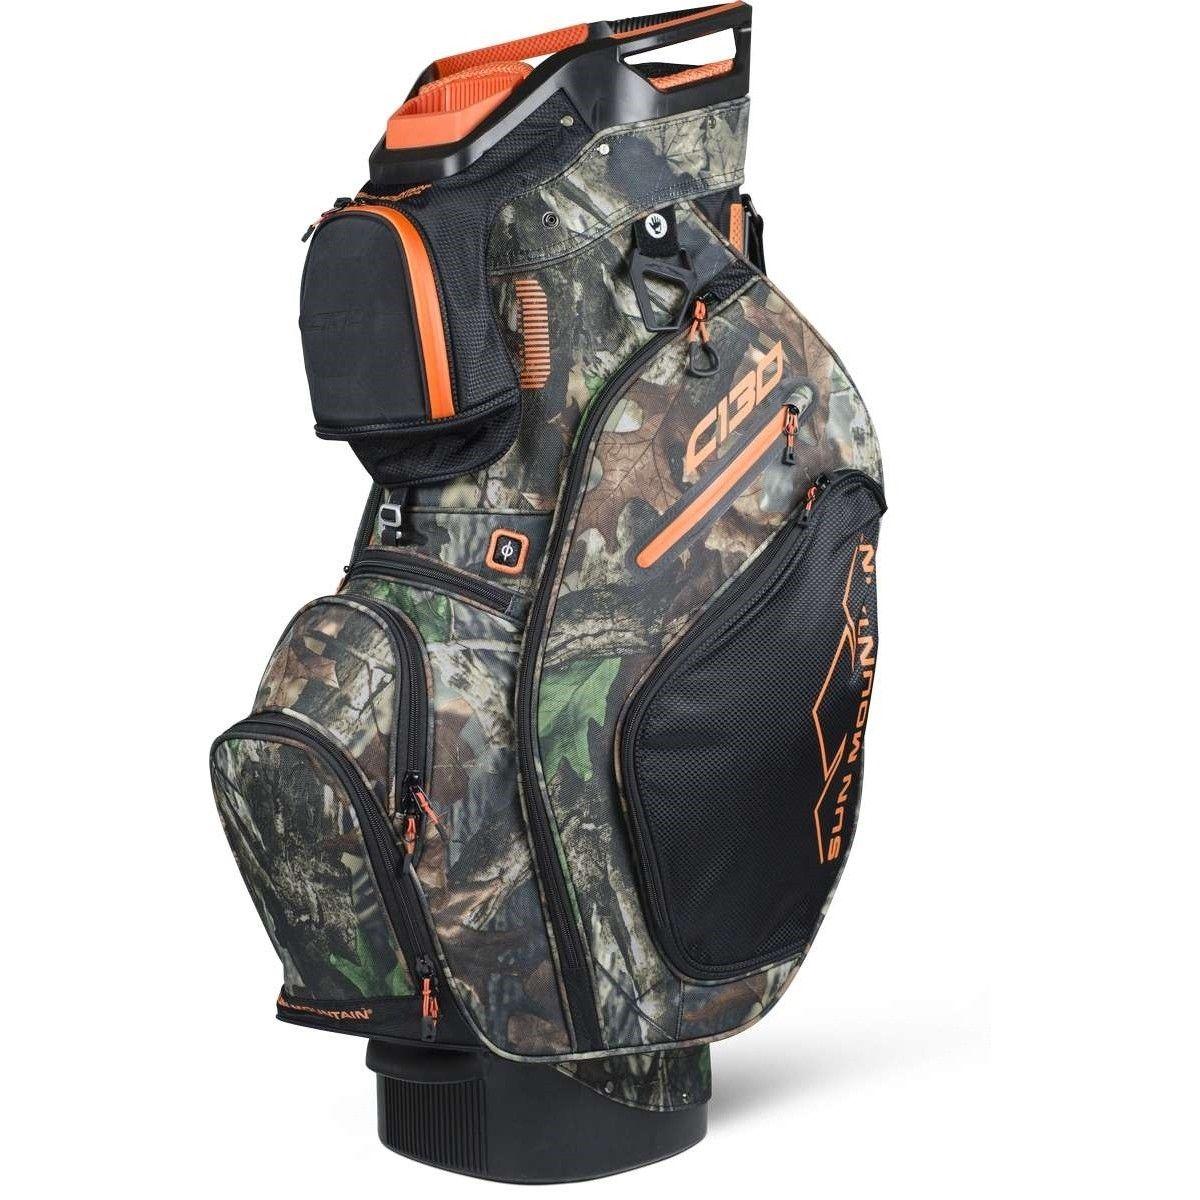 Sun Mountain C 130 Cart Bag 2018 Camo Golf Bags For Sale Golf Shoe Bag Golf Bags